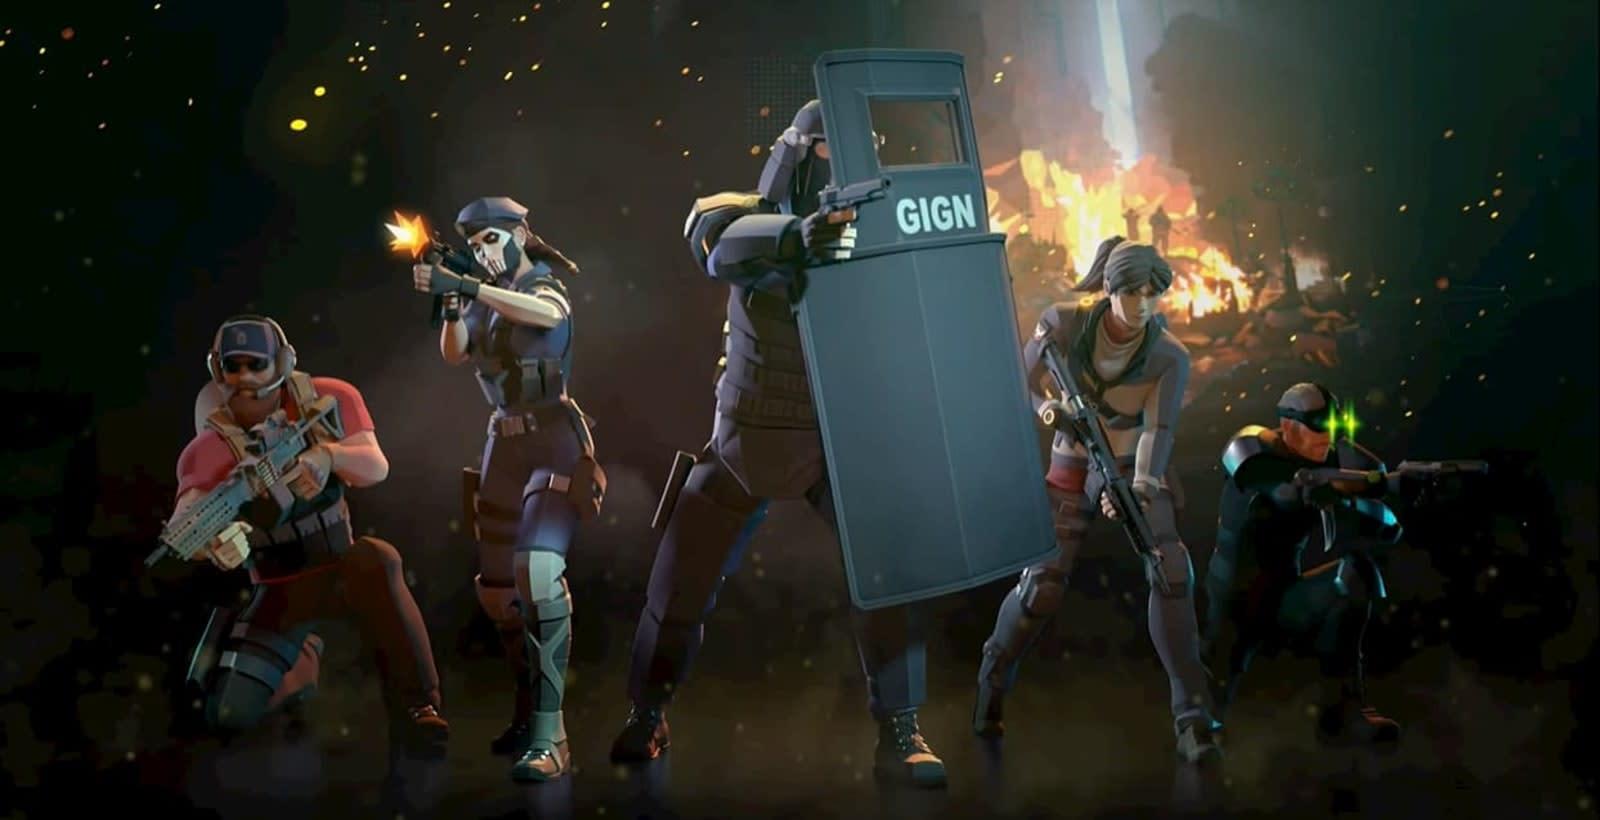 Elite Squad' pulls together a Tom Clancy dream team on mobile